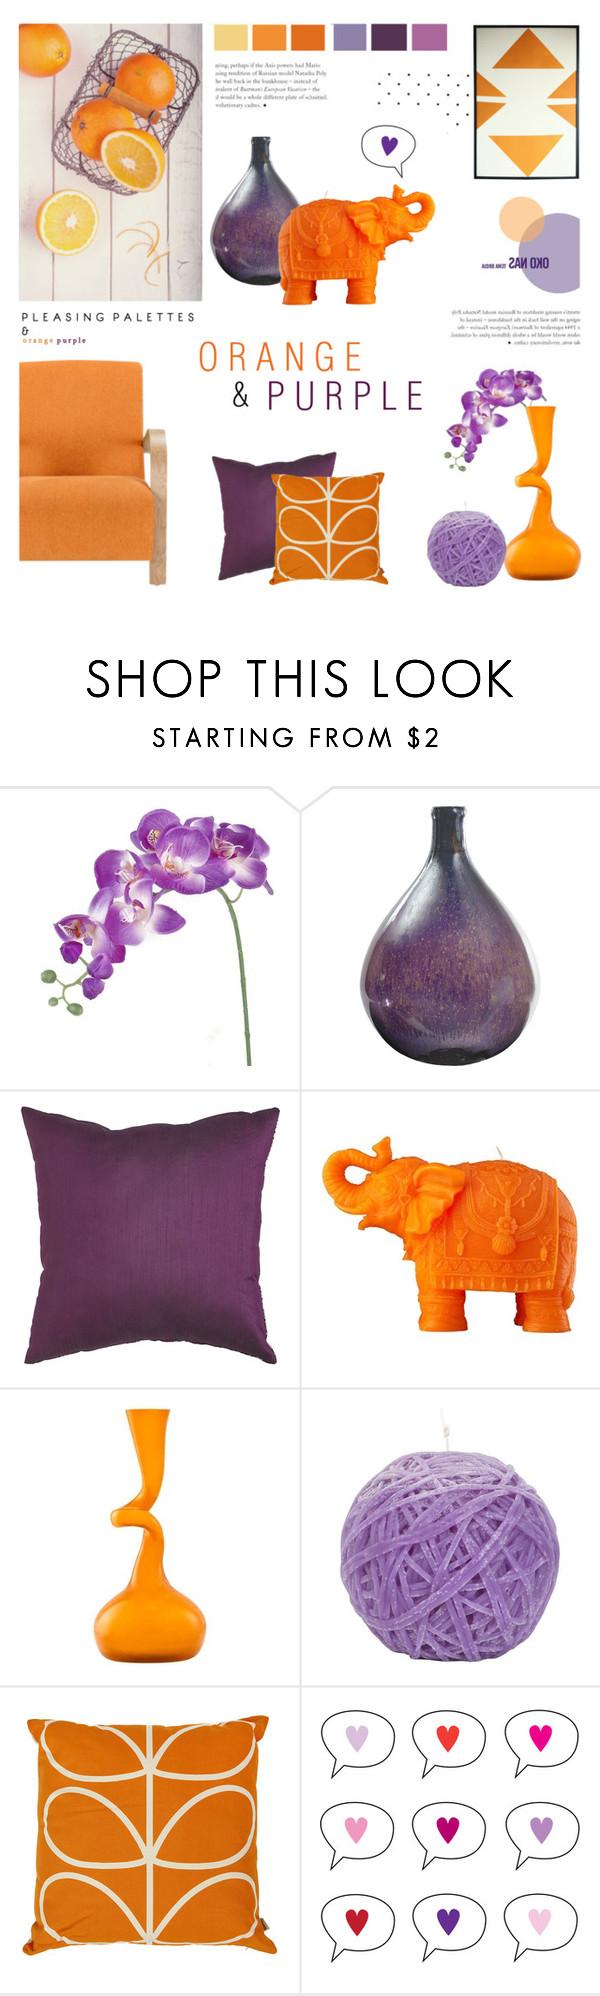 """#3 - Orange & Purple"" by c-silla ❤ liked on Polyvore featuring interior, interiors, interior design, home, home decor, interior decorating, Dot & Bo, Pier 1 Imports, Mario Luca Giusti and Normann Copenhagen"